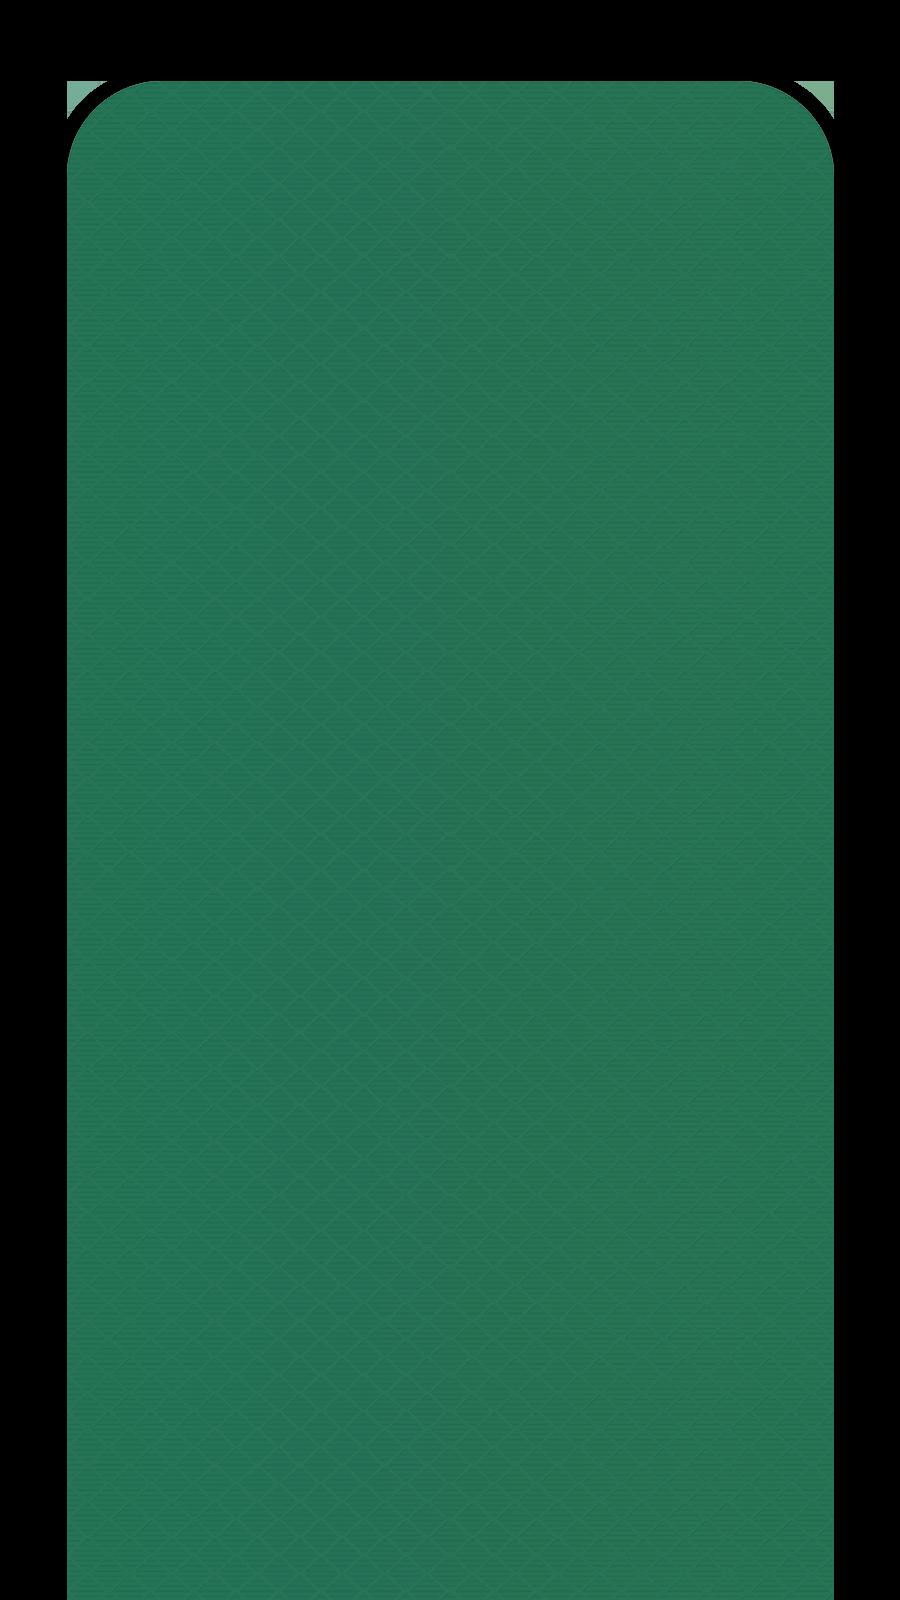 3M™ 4097 Series Green Diamond Grade Sheeting